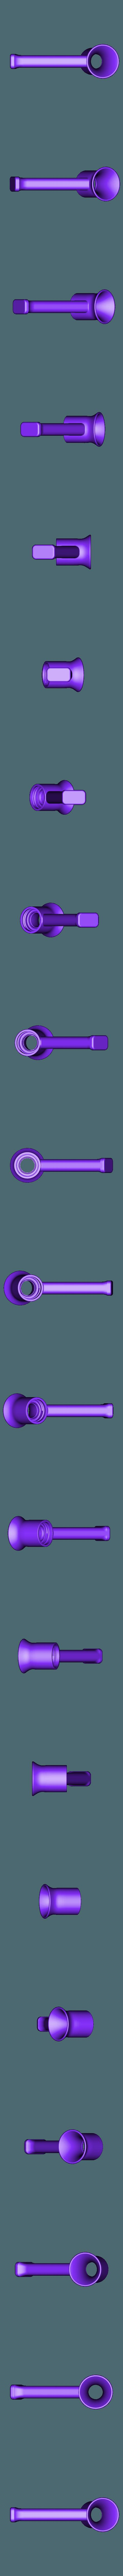 qevc.stl Download free STL file Megaphone for PET Bottle Caps • 3D printable template, Chiisakobe